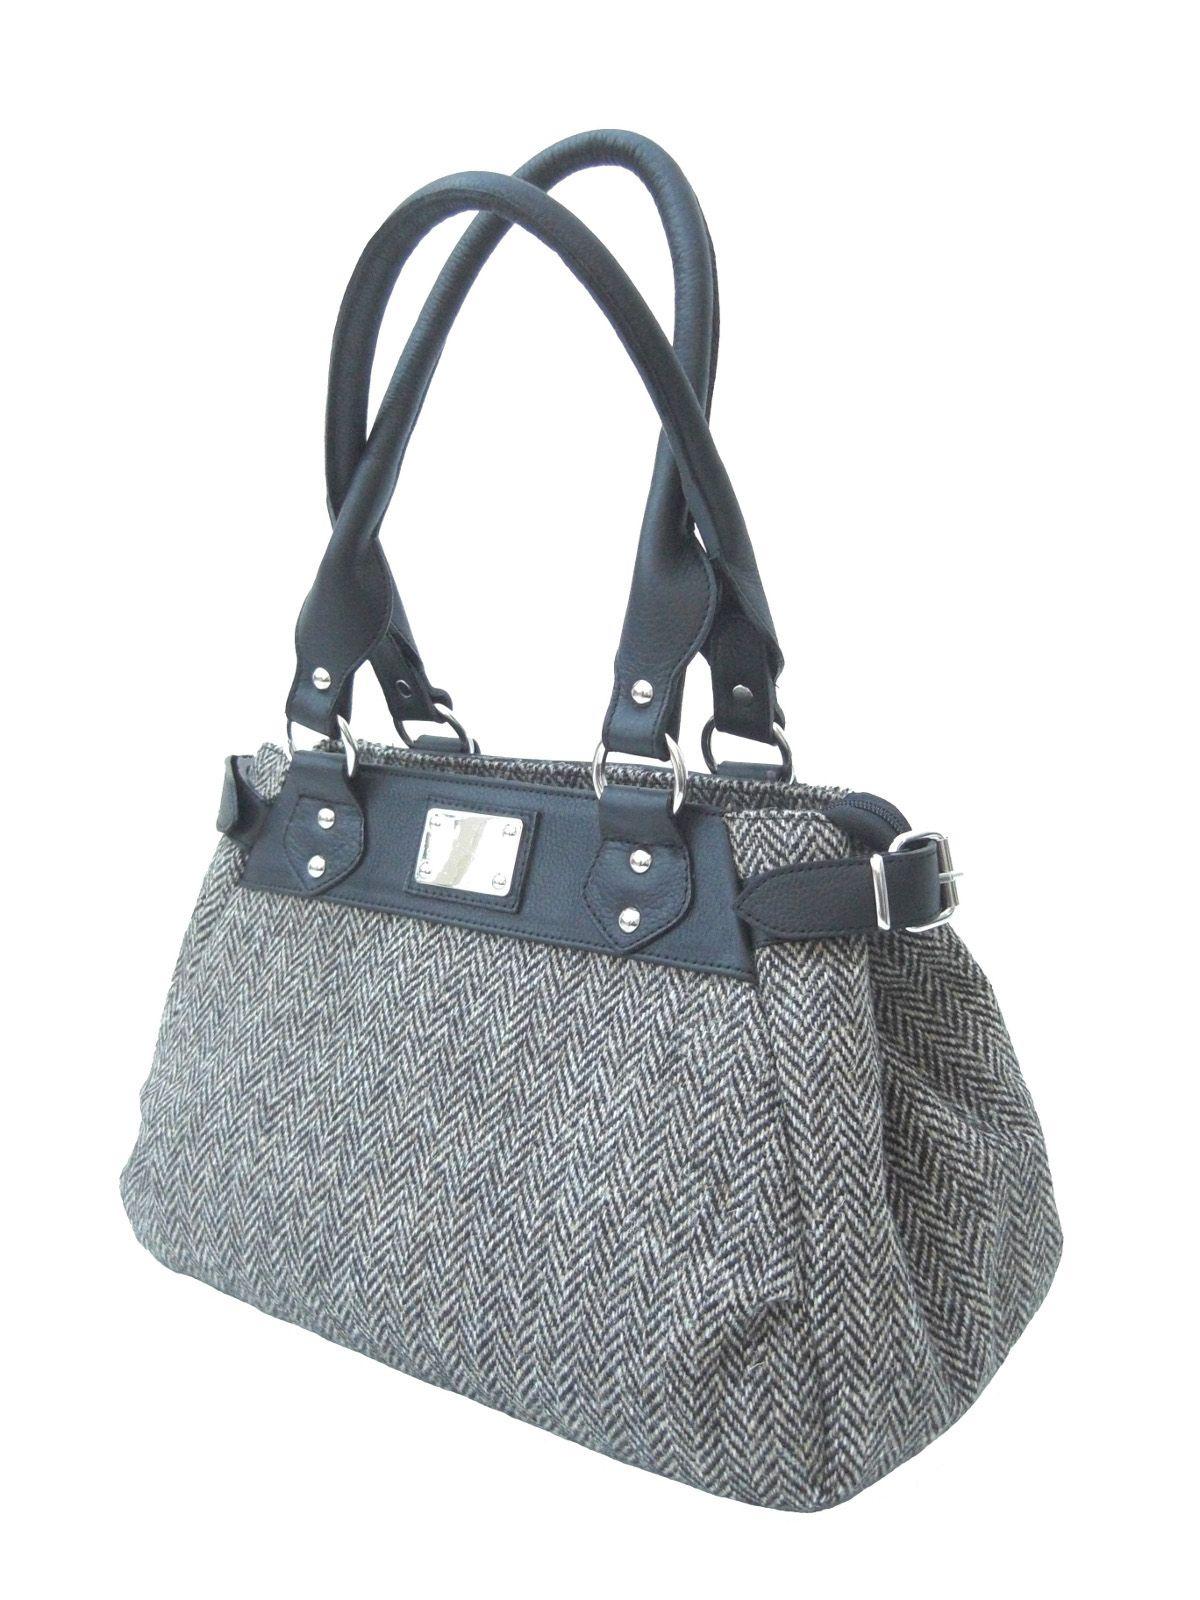 ec8a0858cd42 Harris Tweed Gray Herringbone Handbag with black leather trims ...